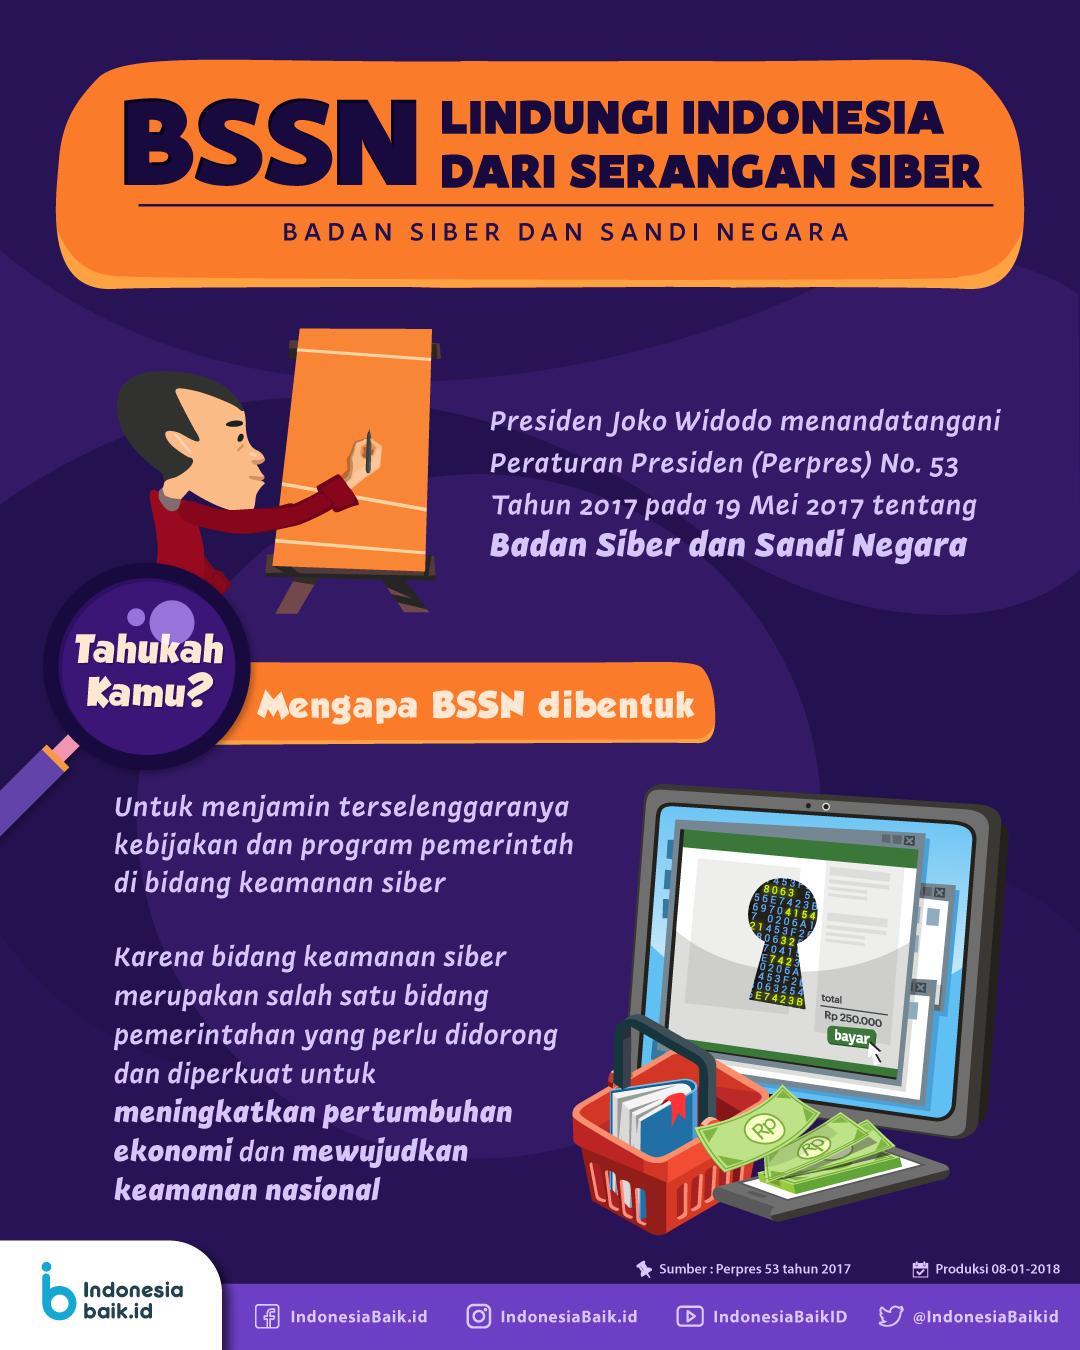 BSSN Lindungi Indonesia Dari Serangan Siber